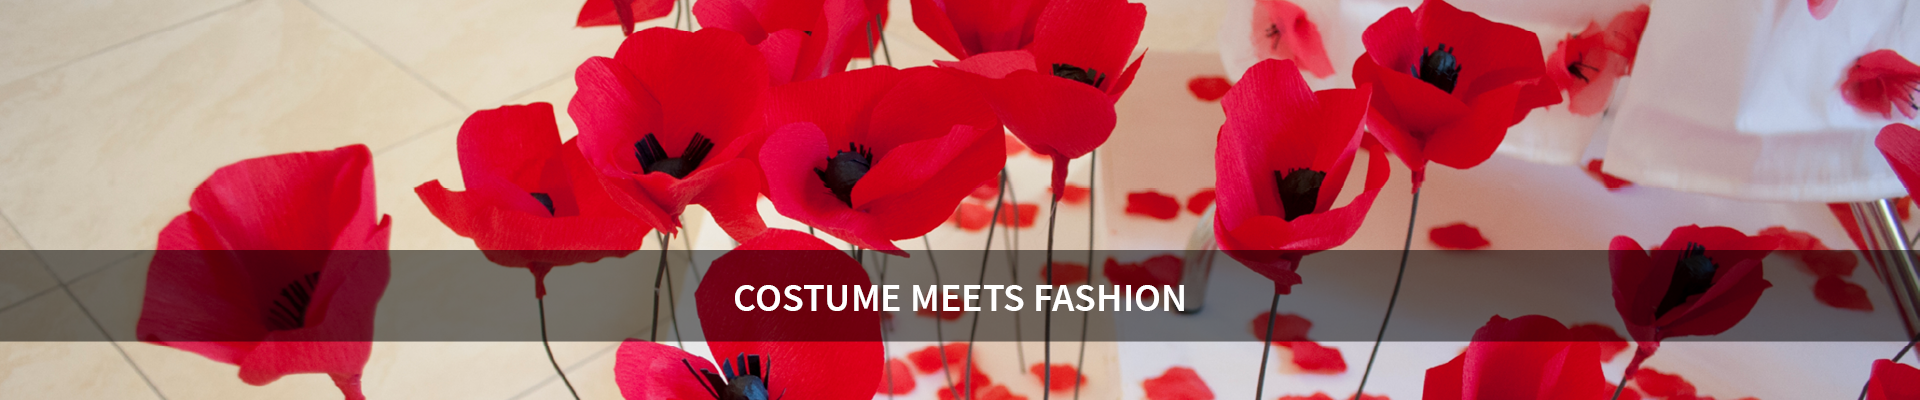 Costume meets fashion -